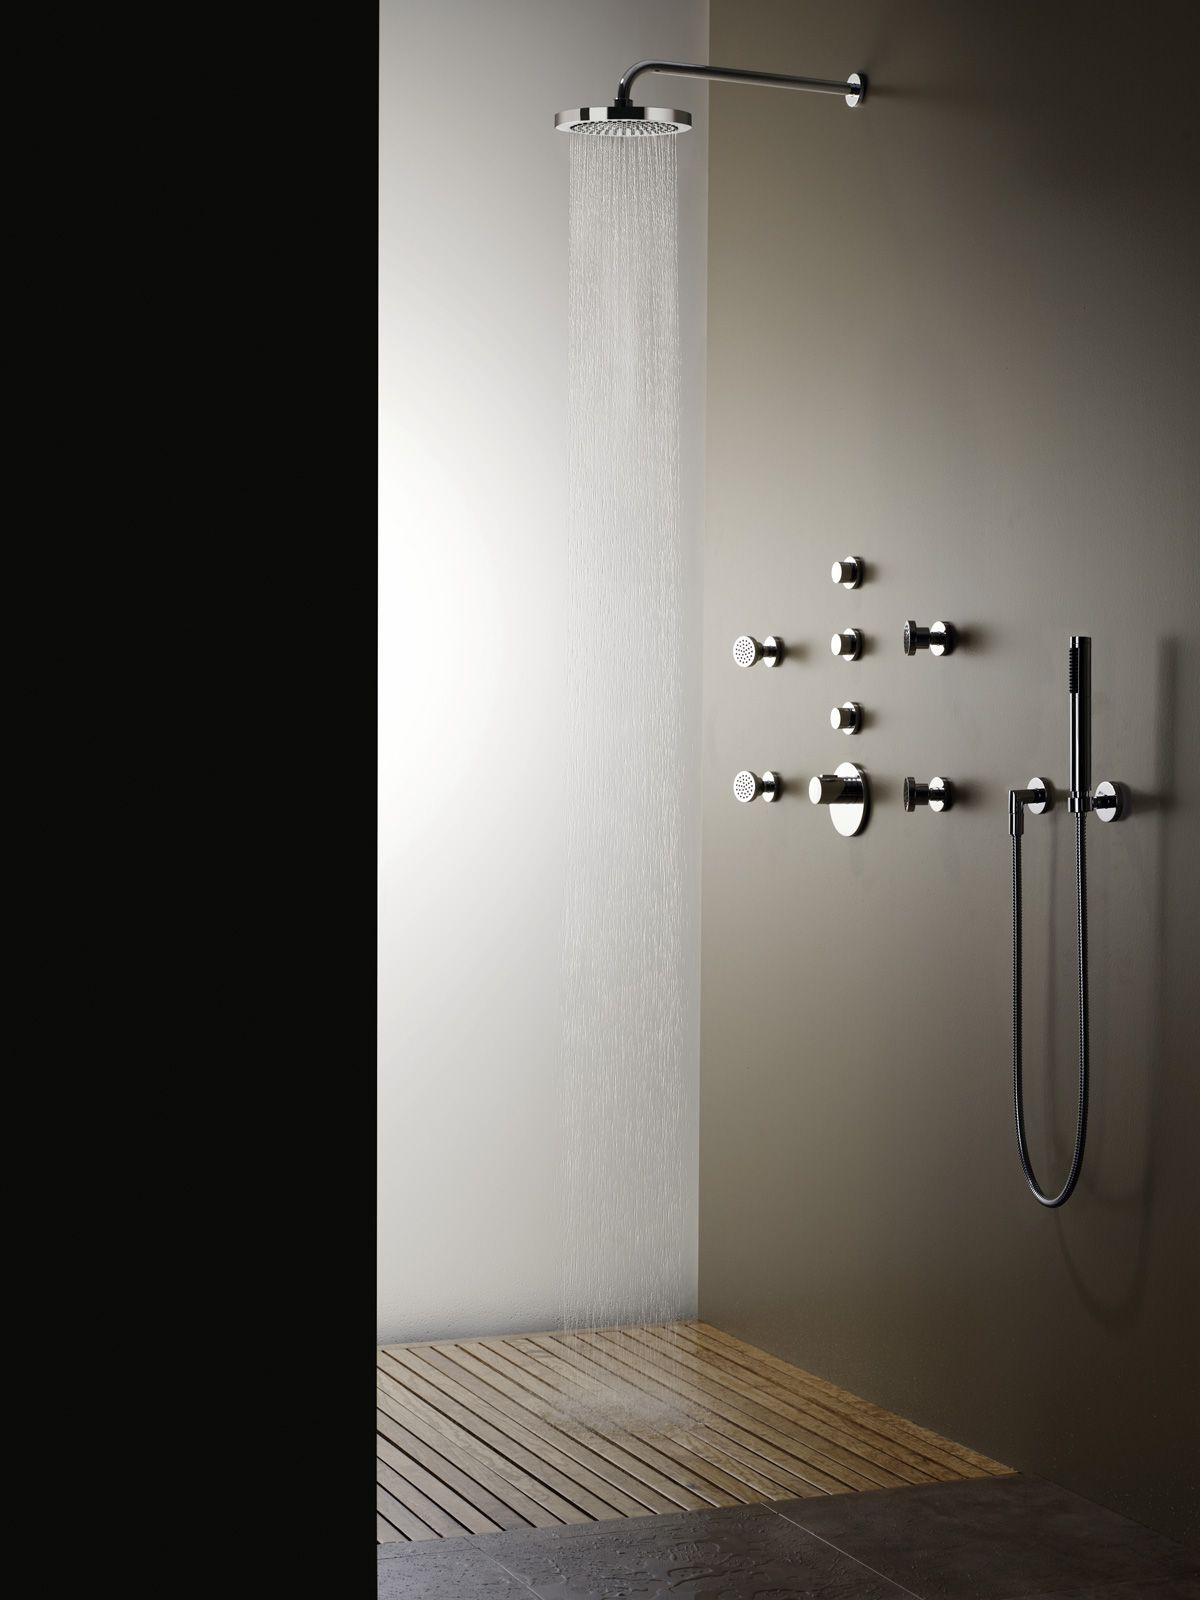 bath spa fitting dornbracht body sprays. Black Bedroom Furniture Sets. Home Design Ideas